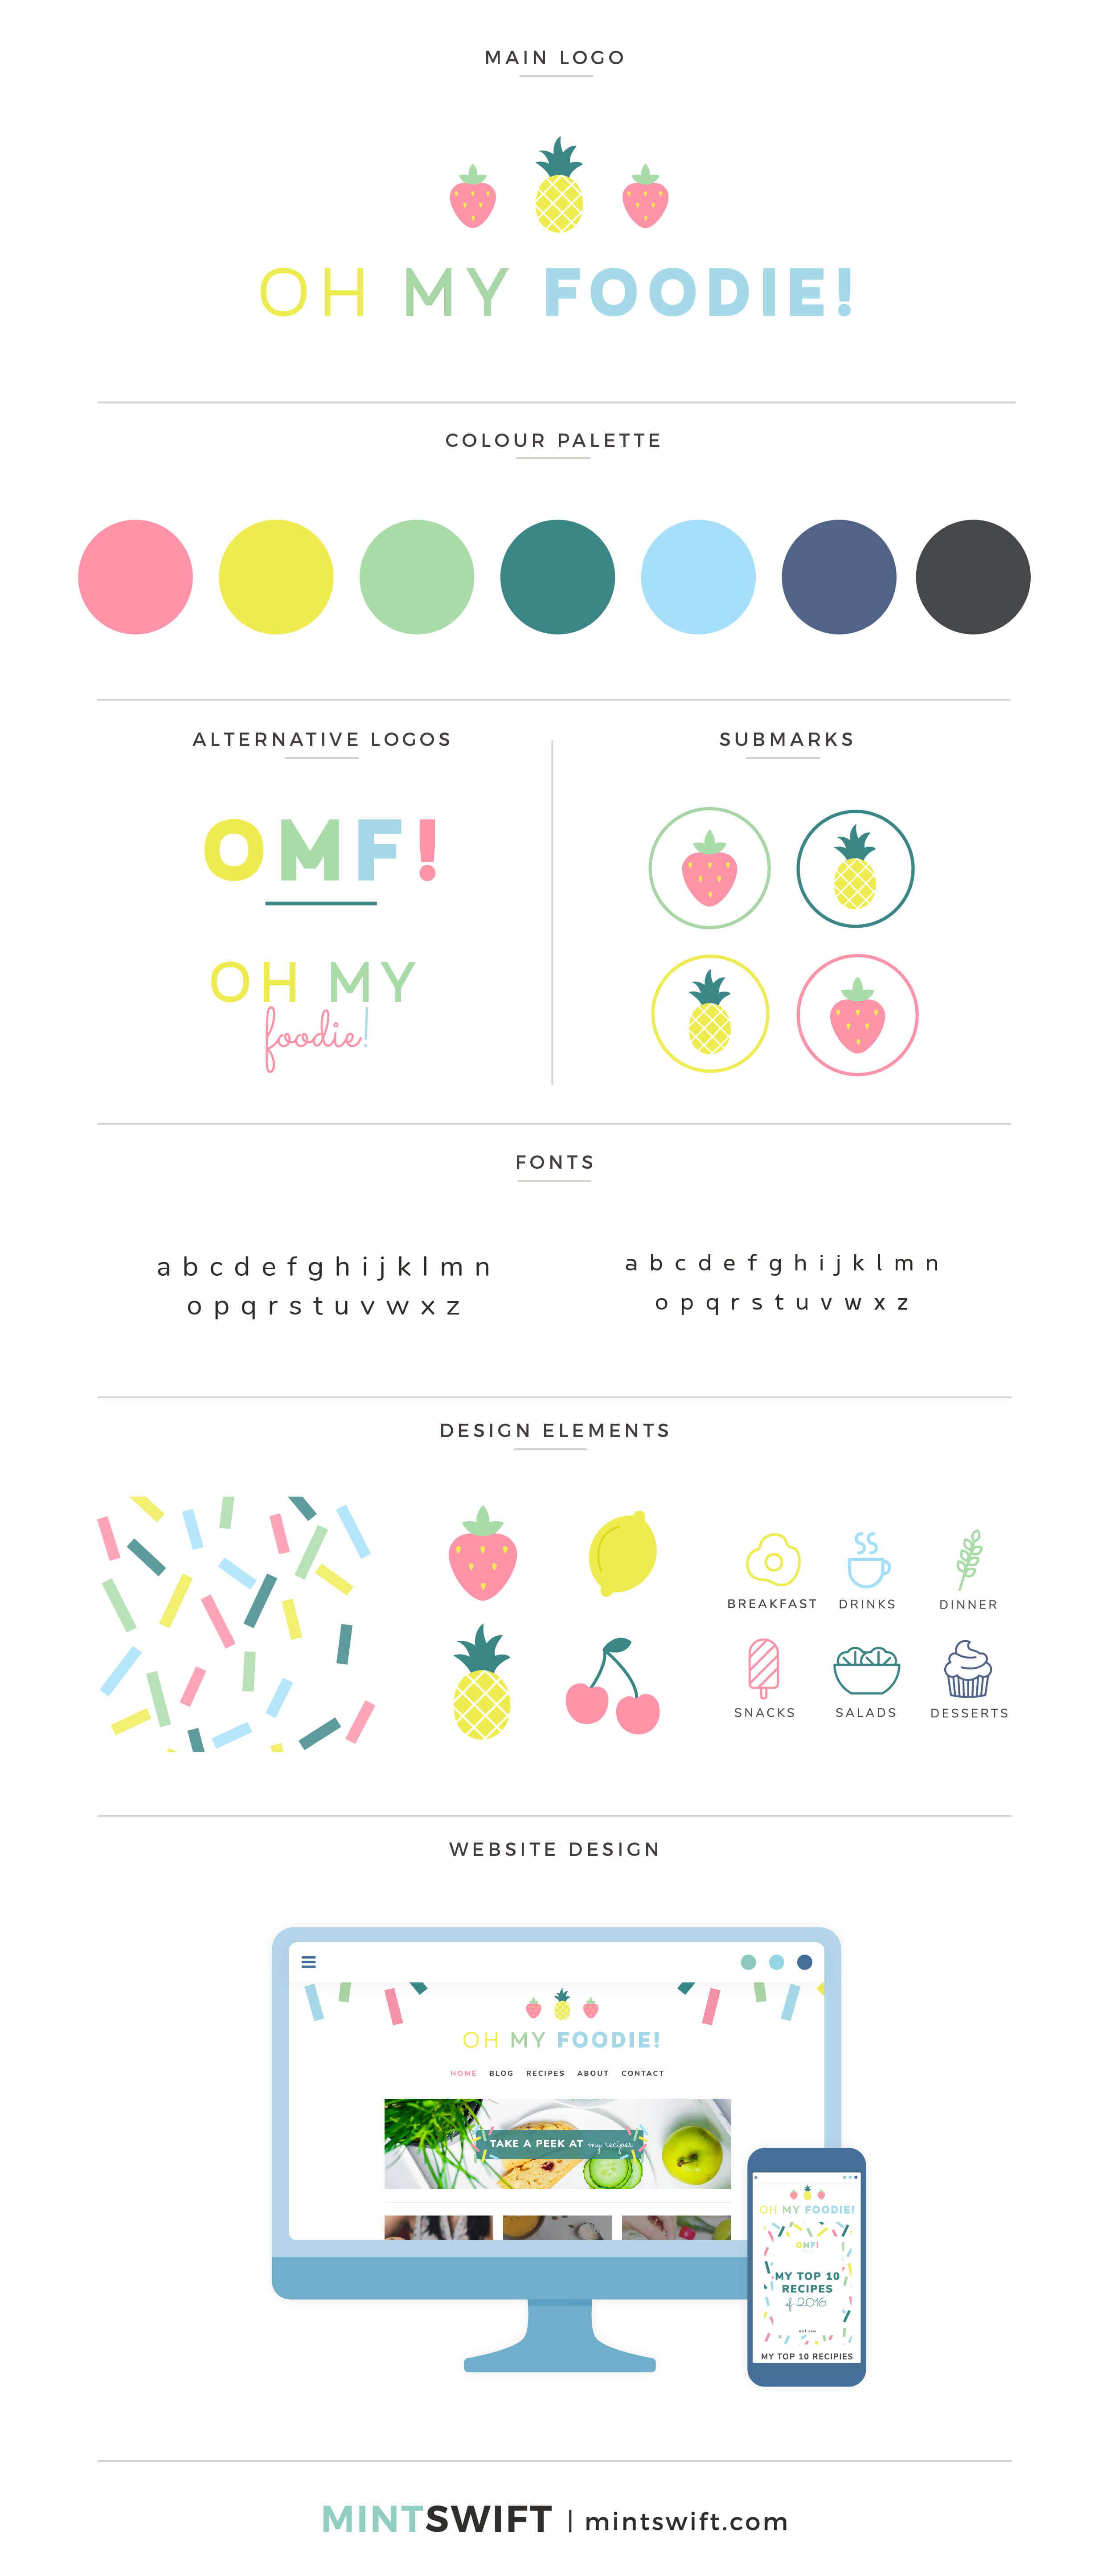 Oh My Foodie - Brand Board - Brand & Website - MintSwift